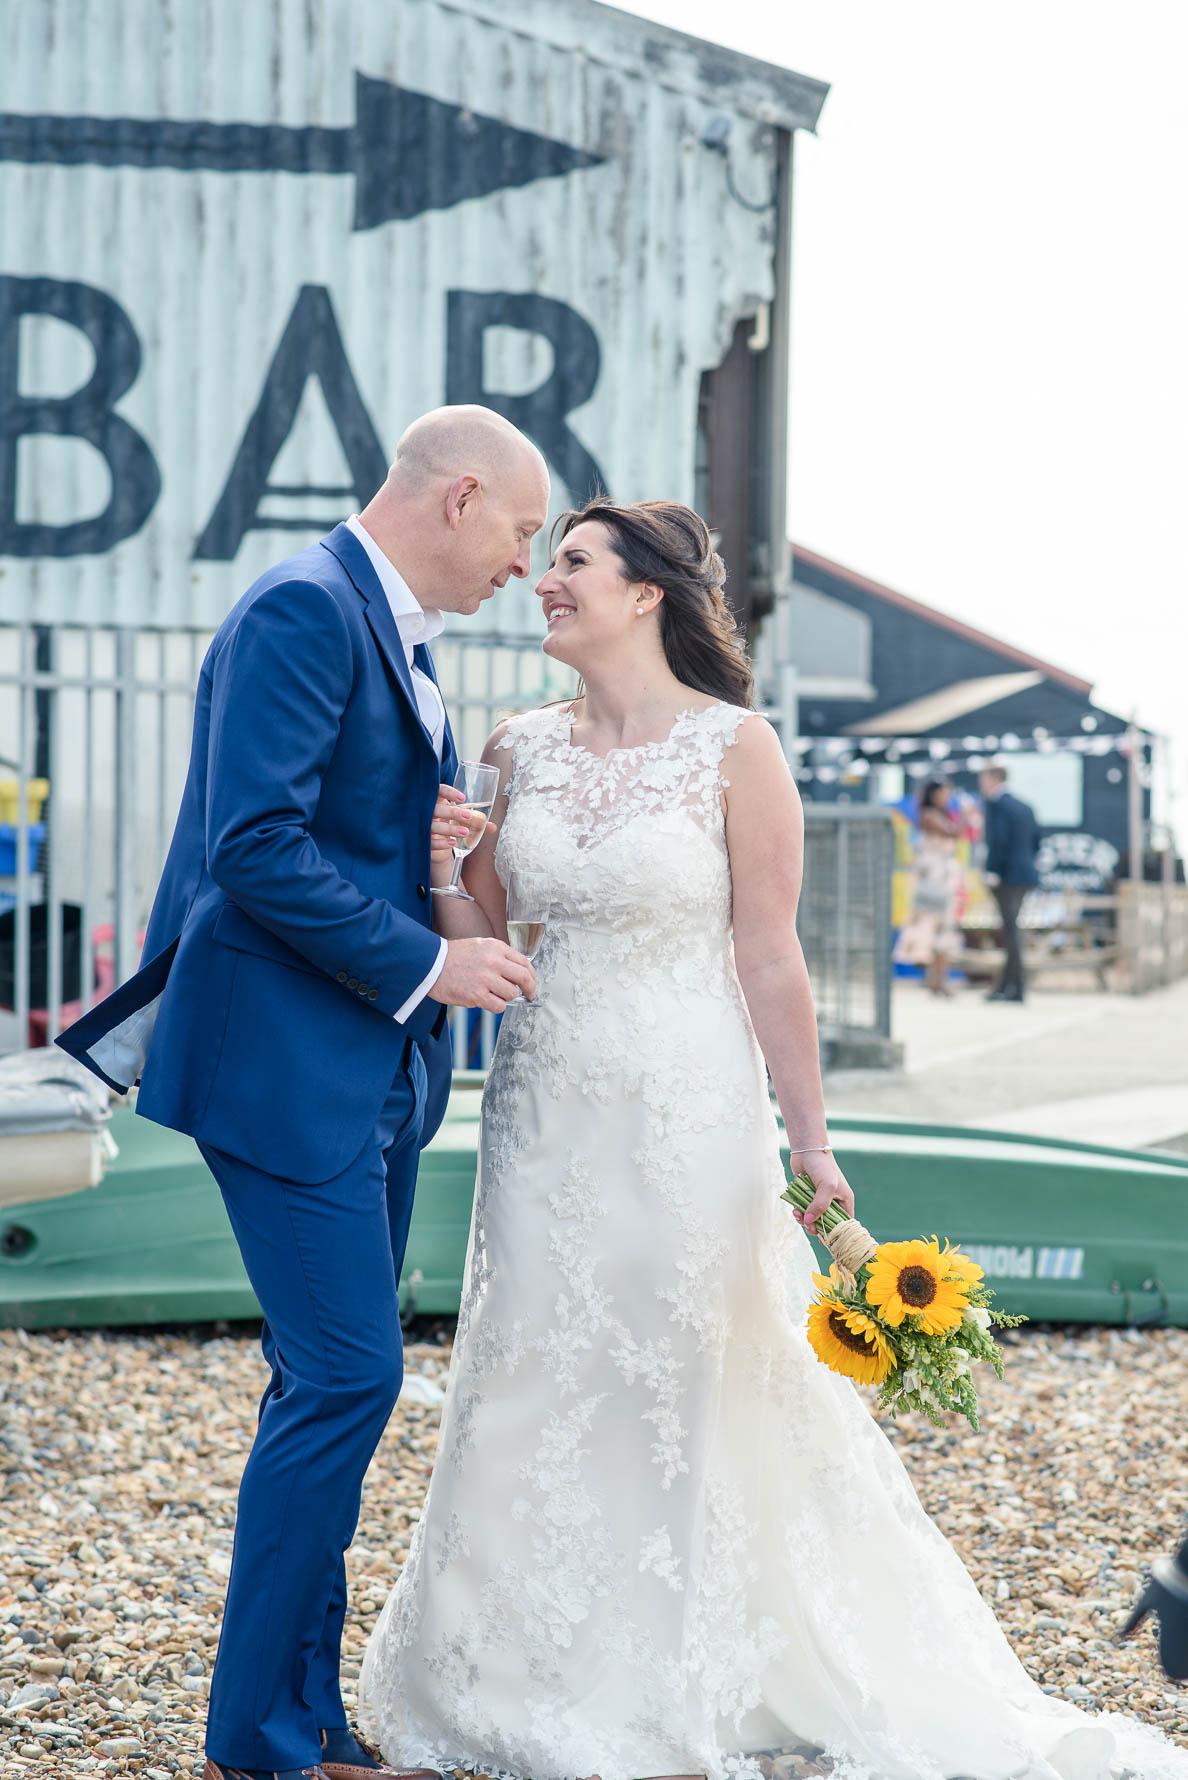 Wedding Photography at East Quay Venue-65.jpg